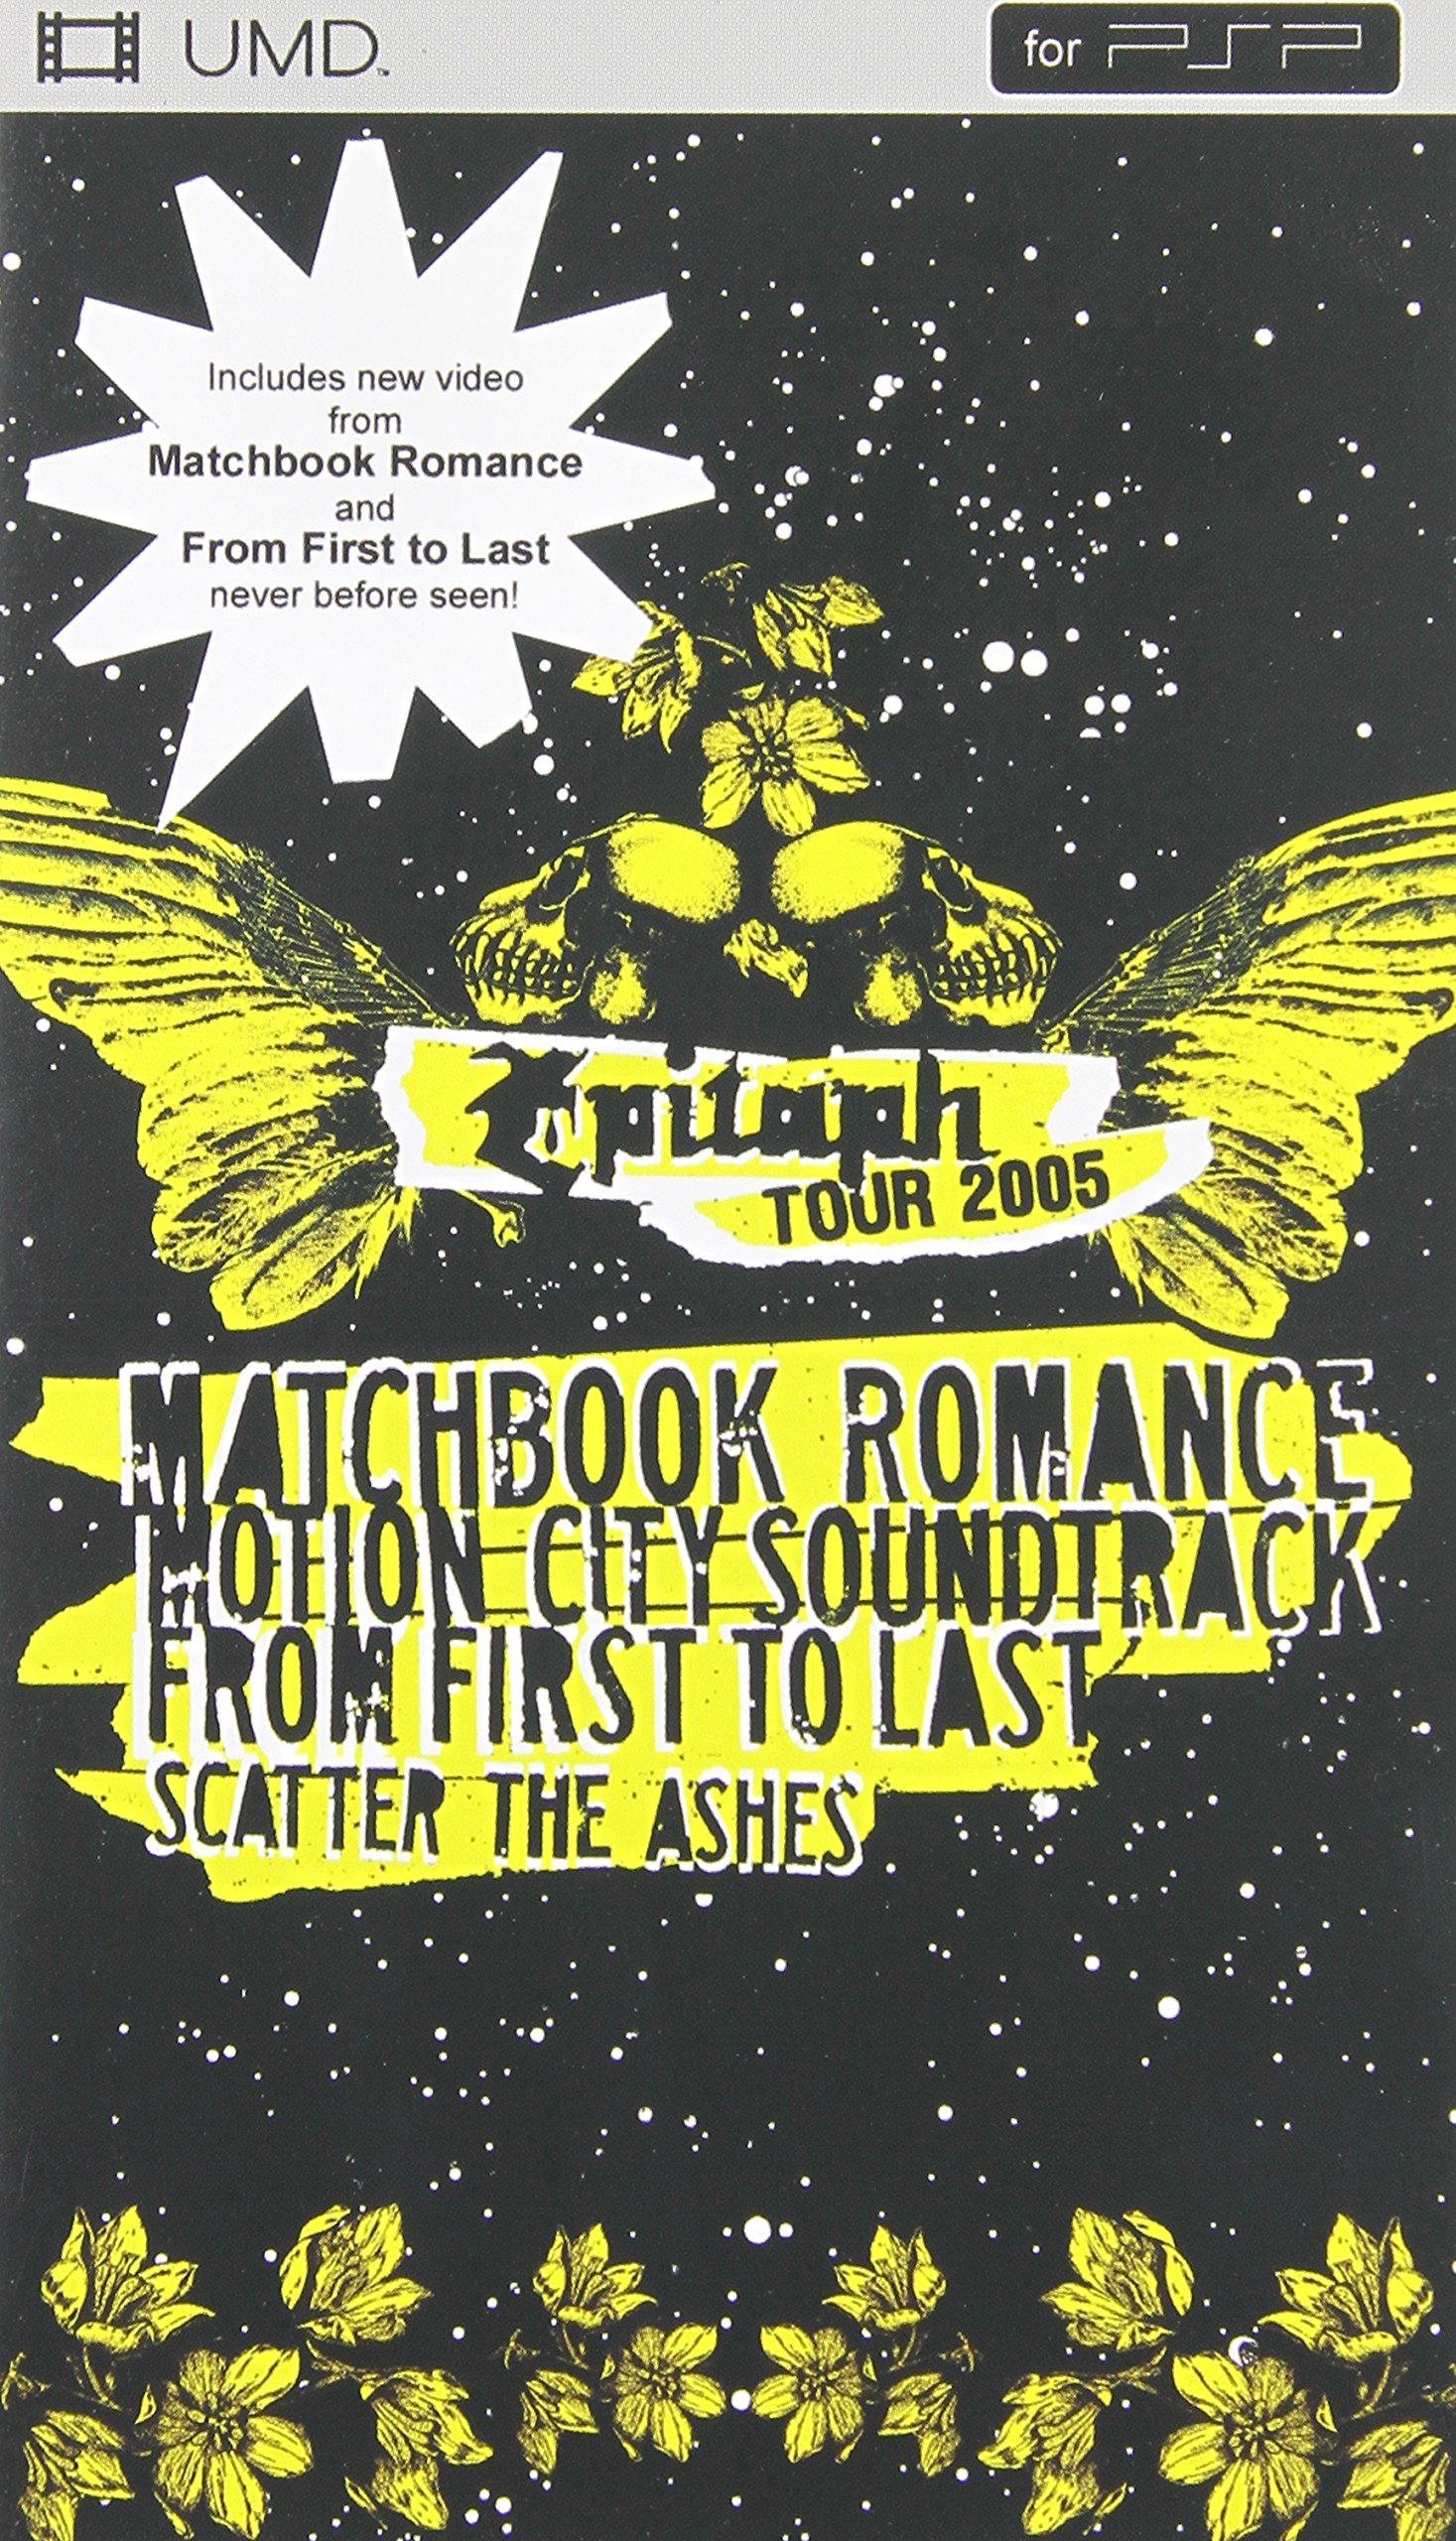 Epitaph Presents: Epitaph Tour 2005 [UMD for PSP]